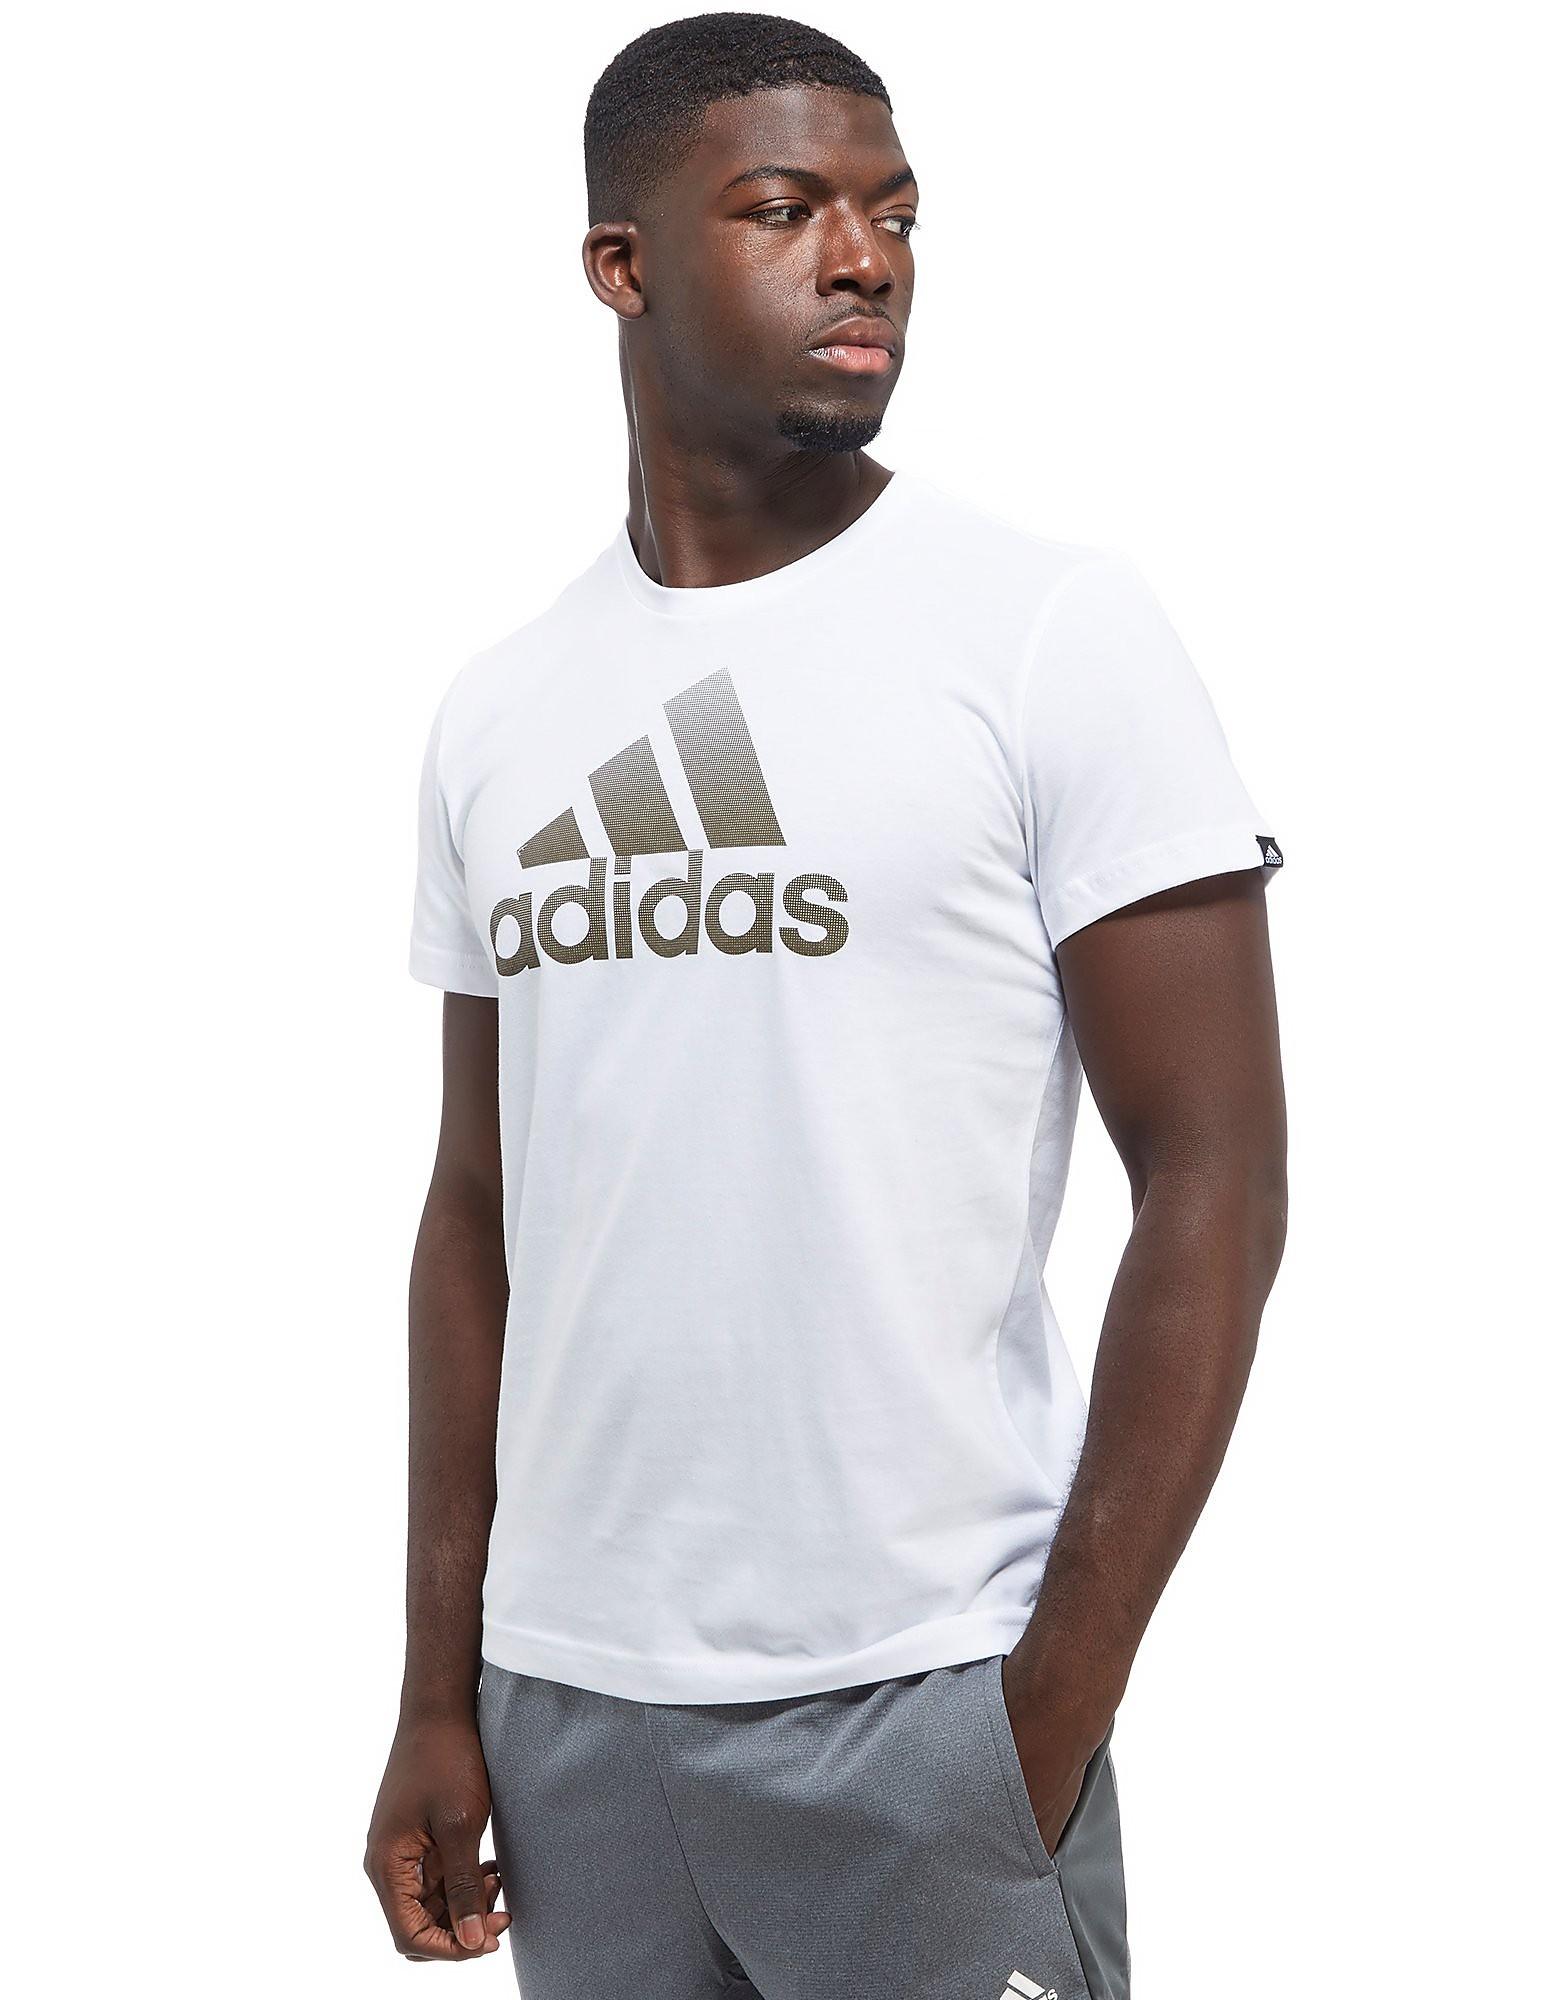 adidas Perforated Fade T-Shirt